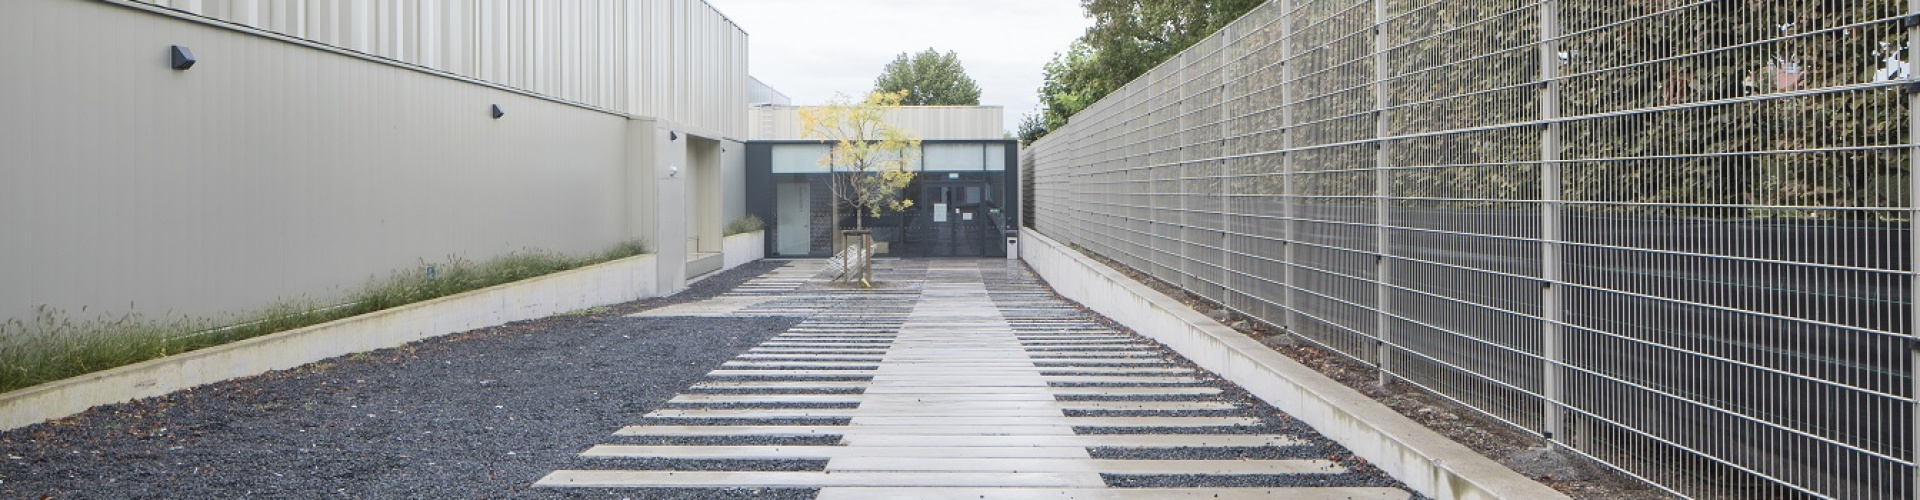 Katholiek secundair en basisonderwijs - sportcomplex Gronehof Oudenaarde